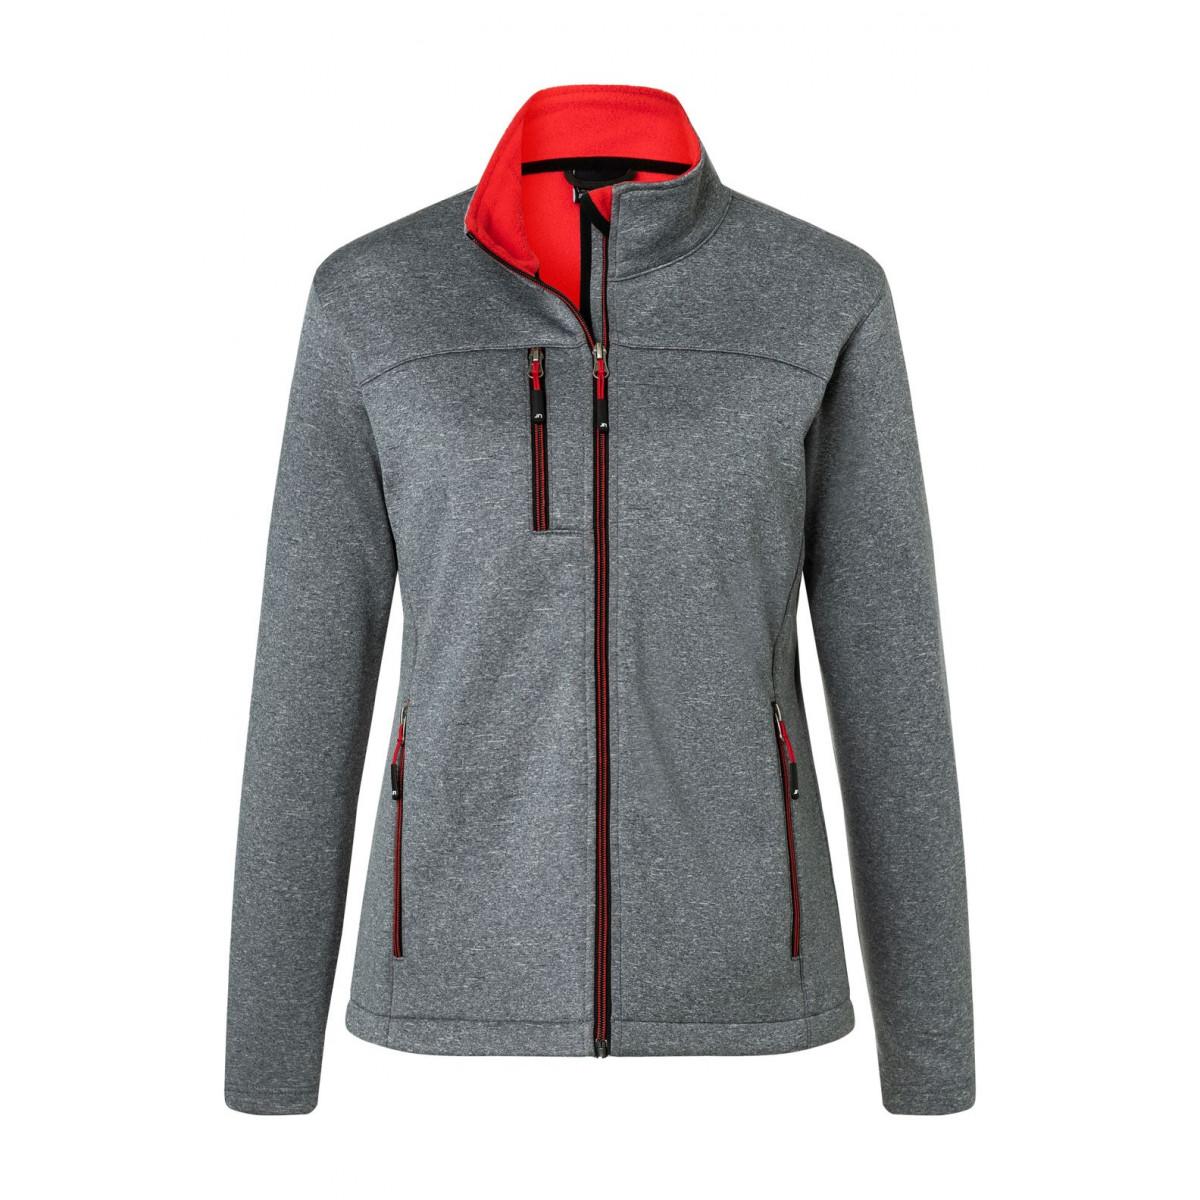 Куртка женская JN1147 Ladies Softshell Jacket - Темно-серый меланж/Красный